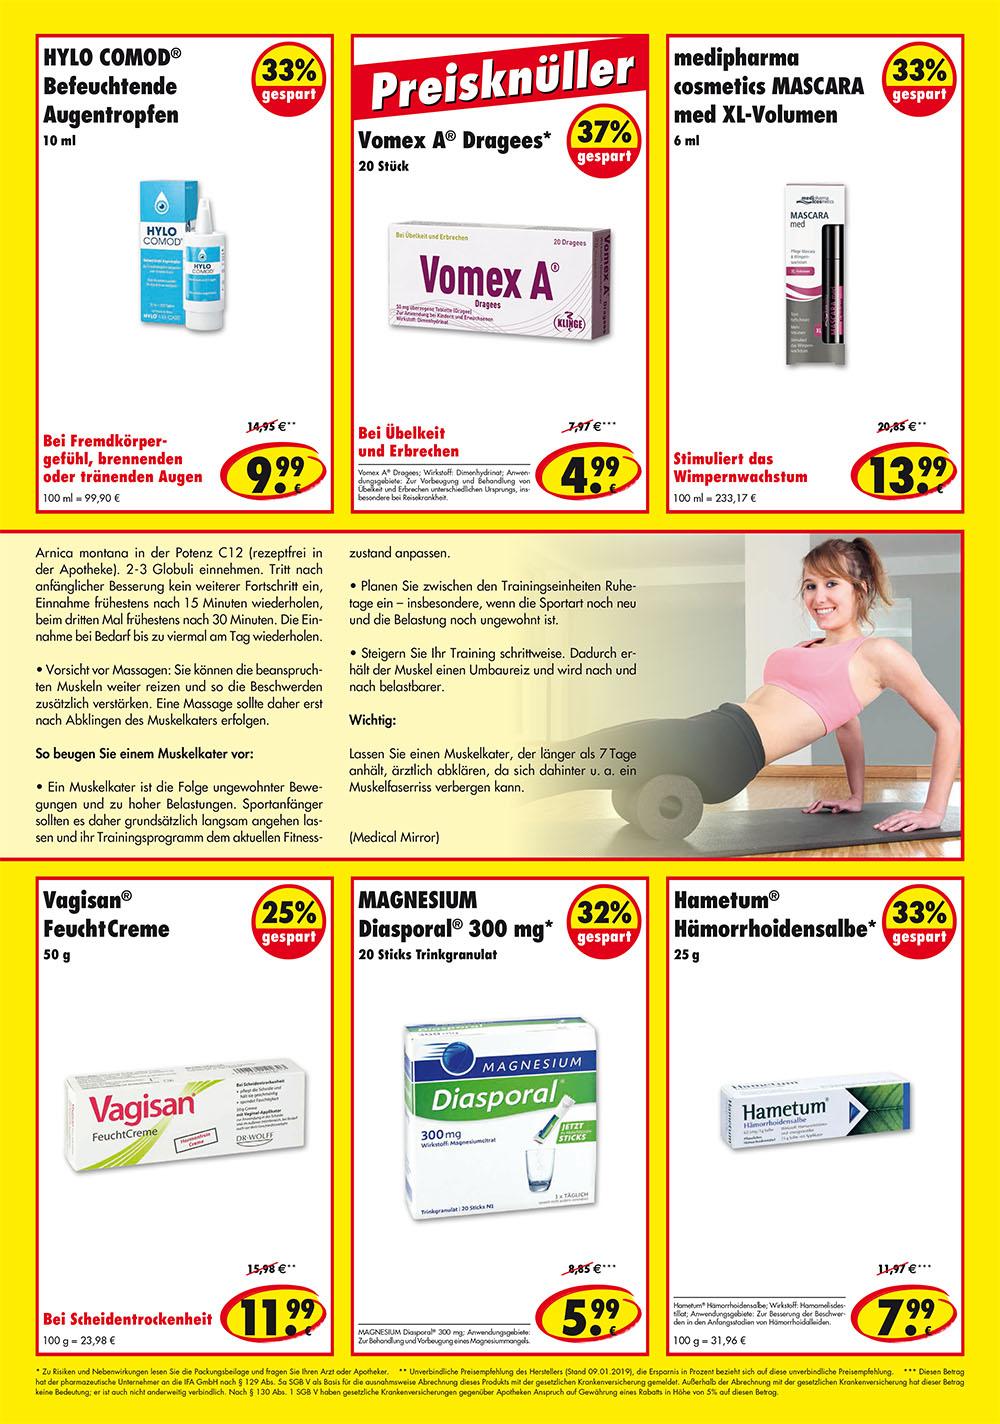 http://www.apotheken.de/fileadmin/clubarea/00000-Angebote/47447_13605_ahorn_angebot_3.jpg